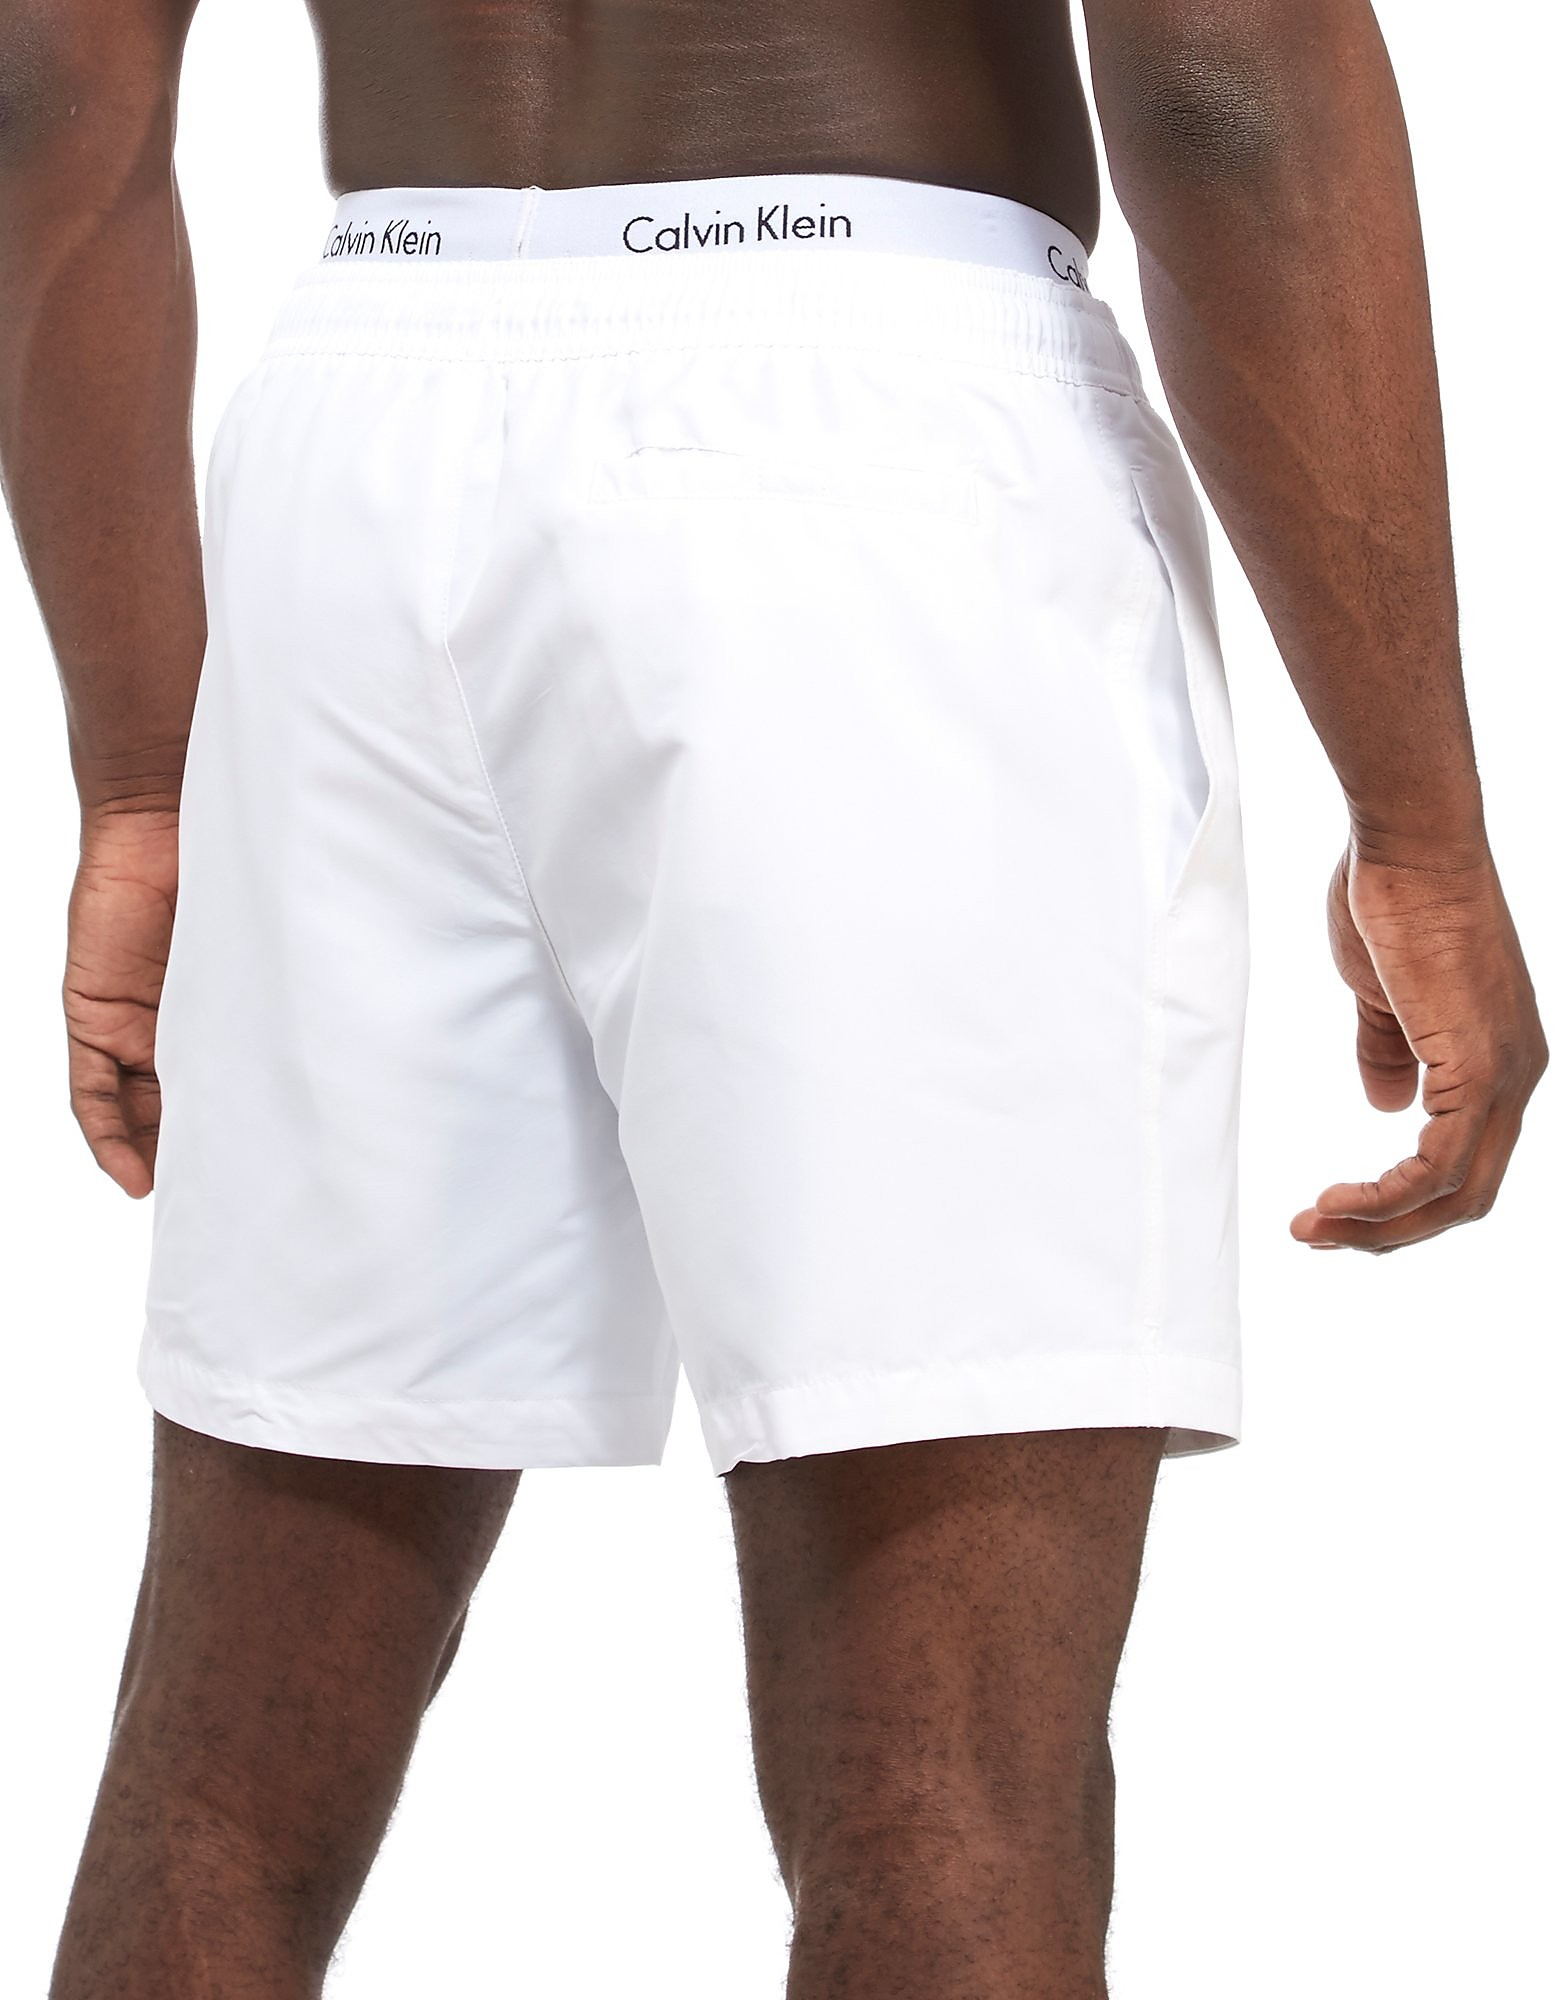 Calvin Klein Double Waist Band Swim Shorts